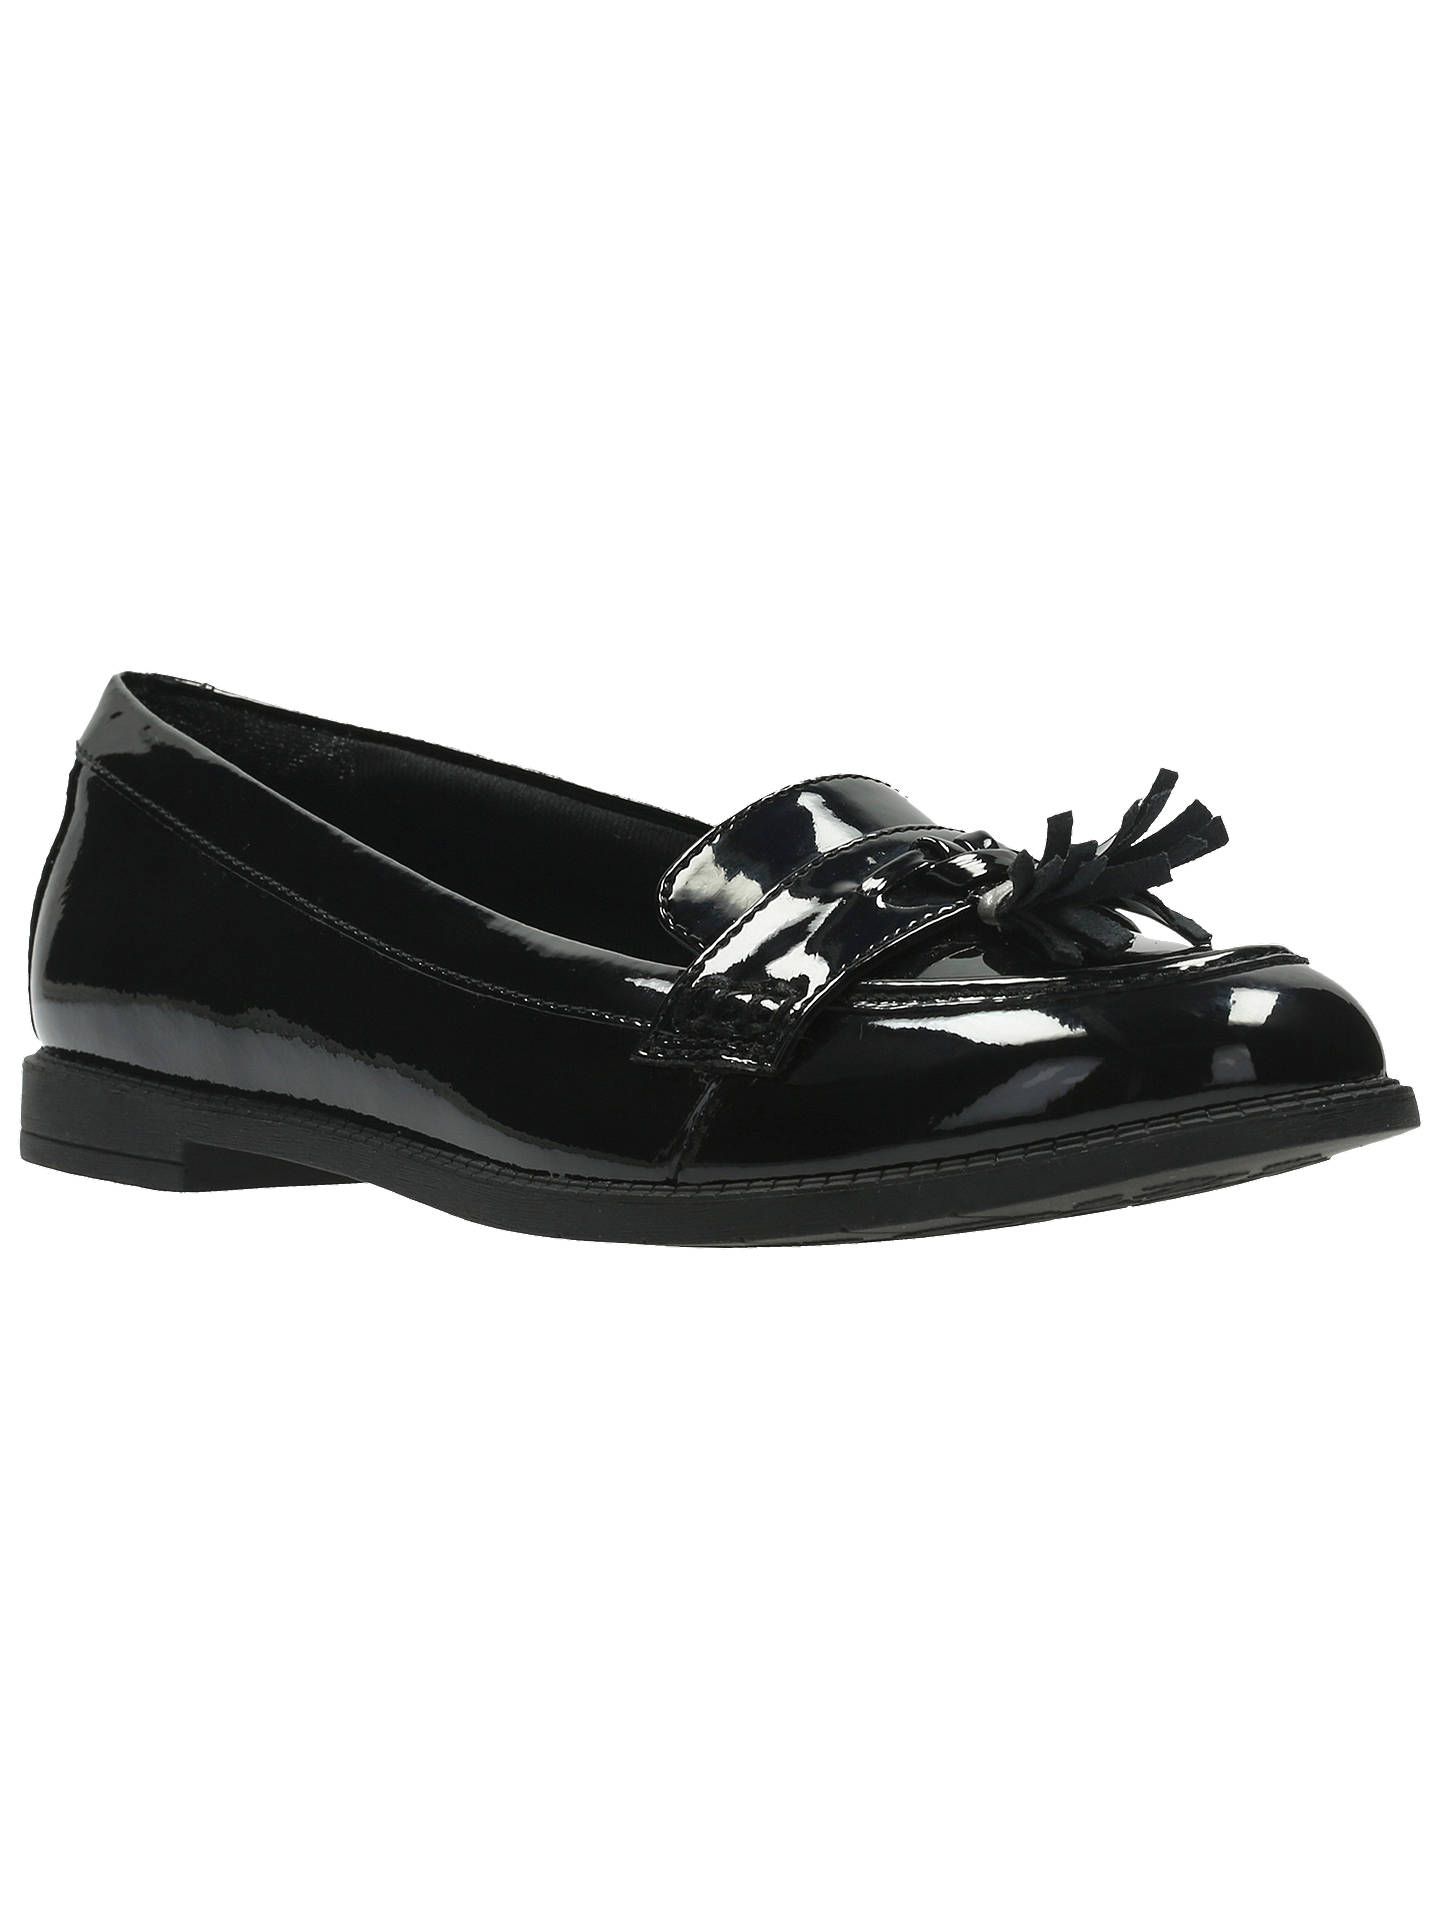 1ec57b5f6e1 Buy Clarks Children s Preppy Edge Shoes